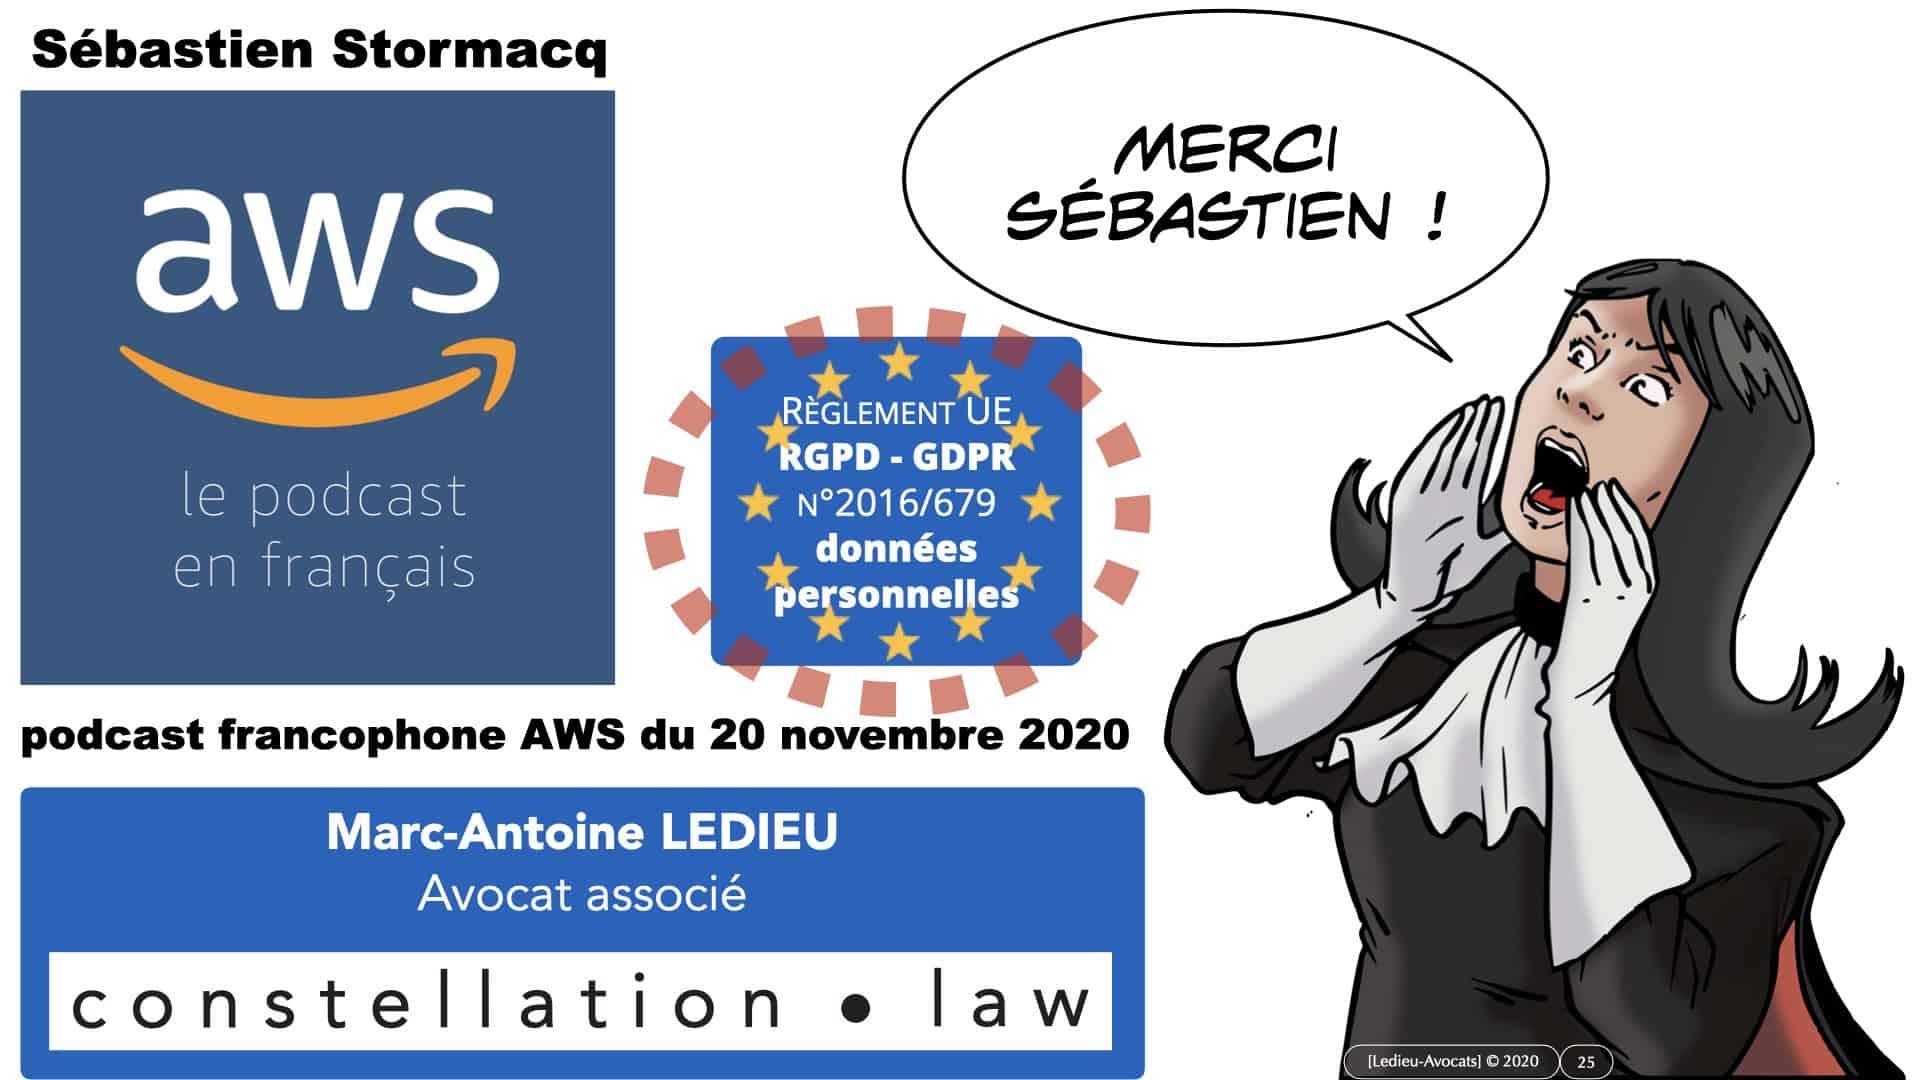 312 AWS PODCAST RGPD [20-11-2020] *16:9* © Ledieu-Avocats MERCI SEBASTIEN !